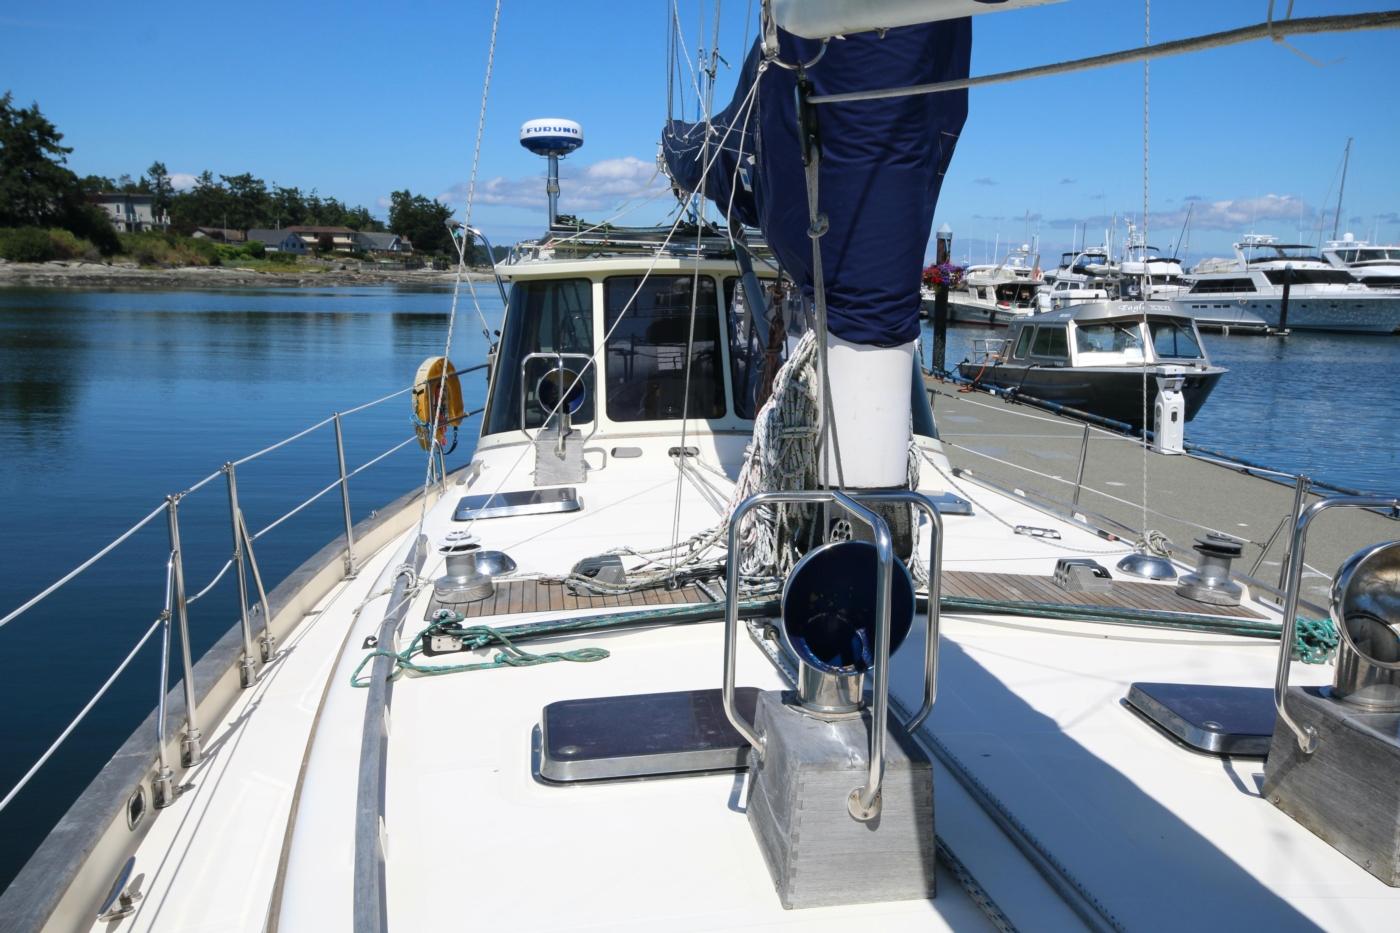 1996 Tanton 45 Offshore, View aft